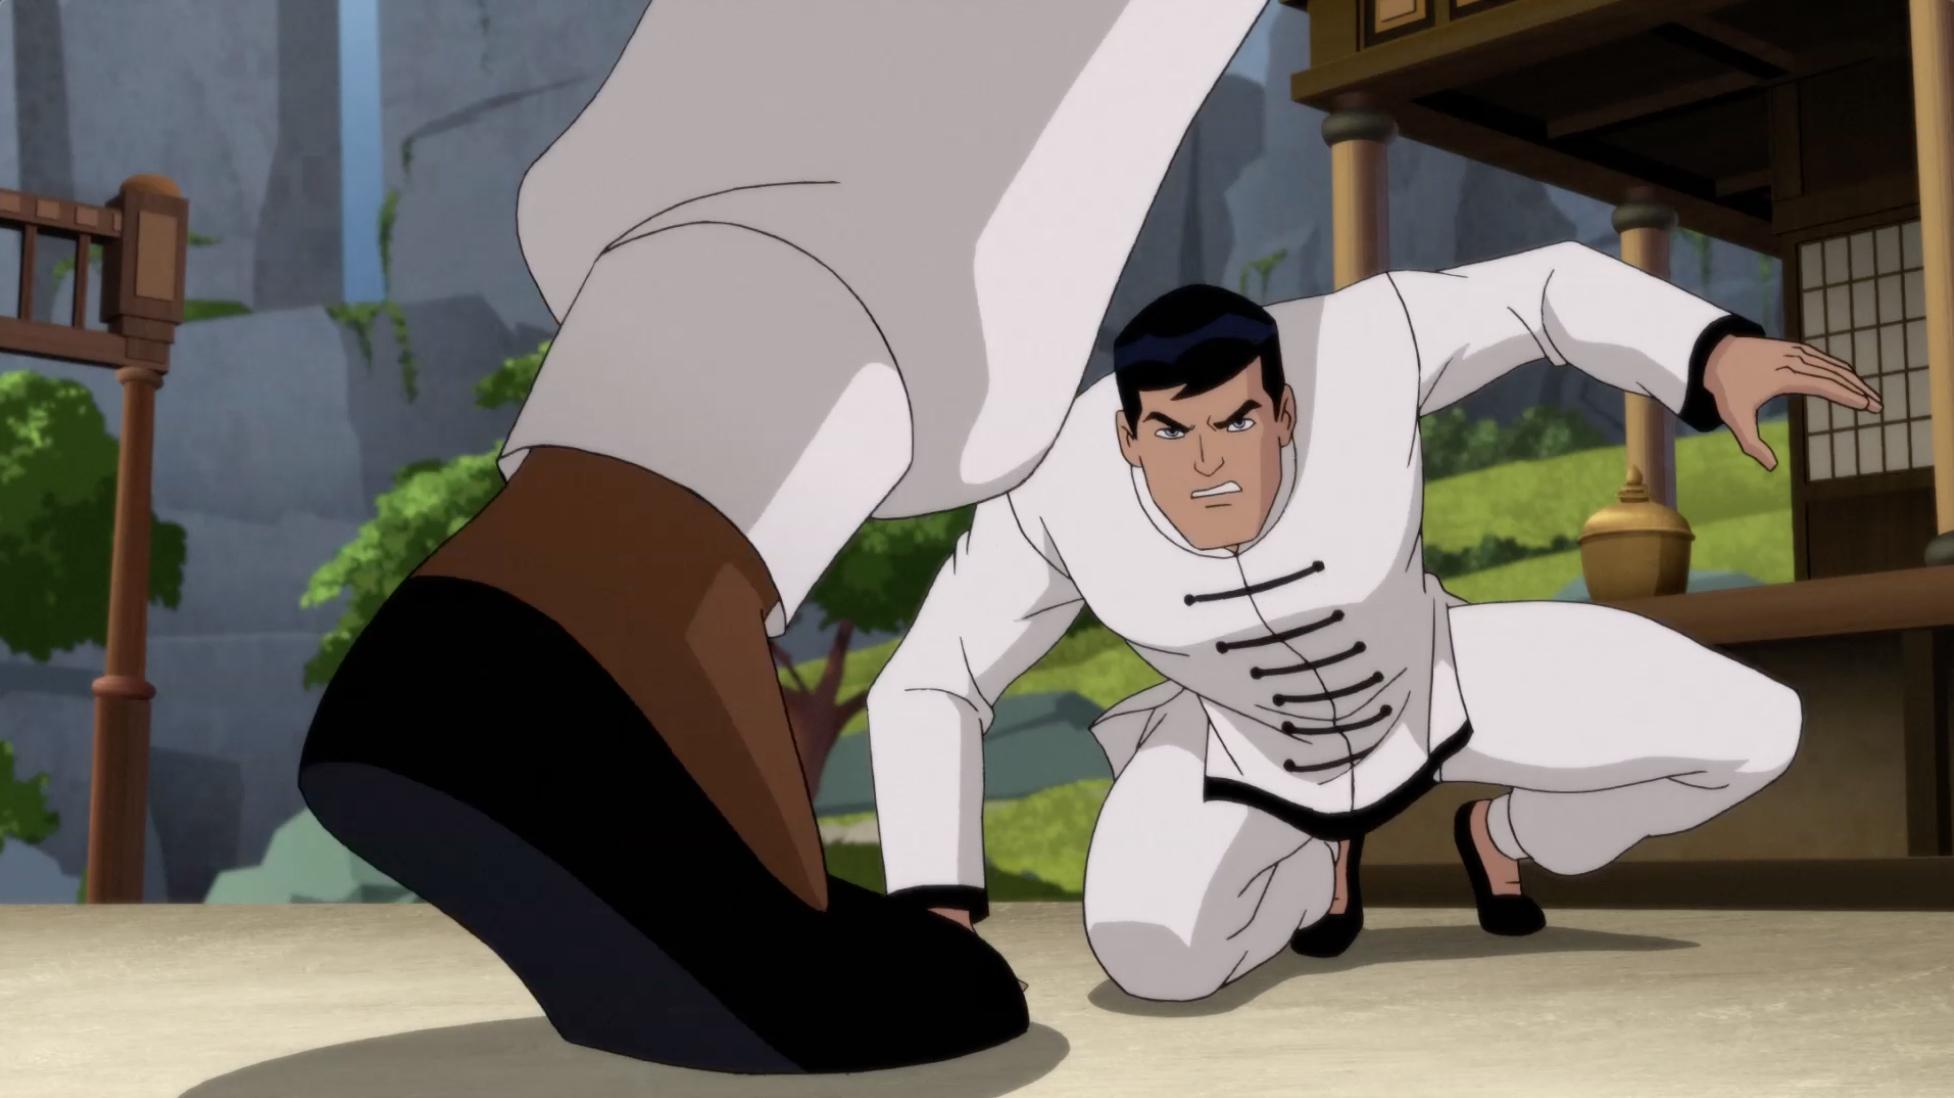 BSOTD Bruce Wayne fight